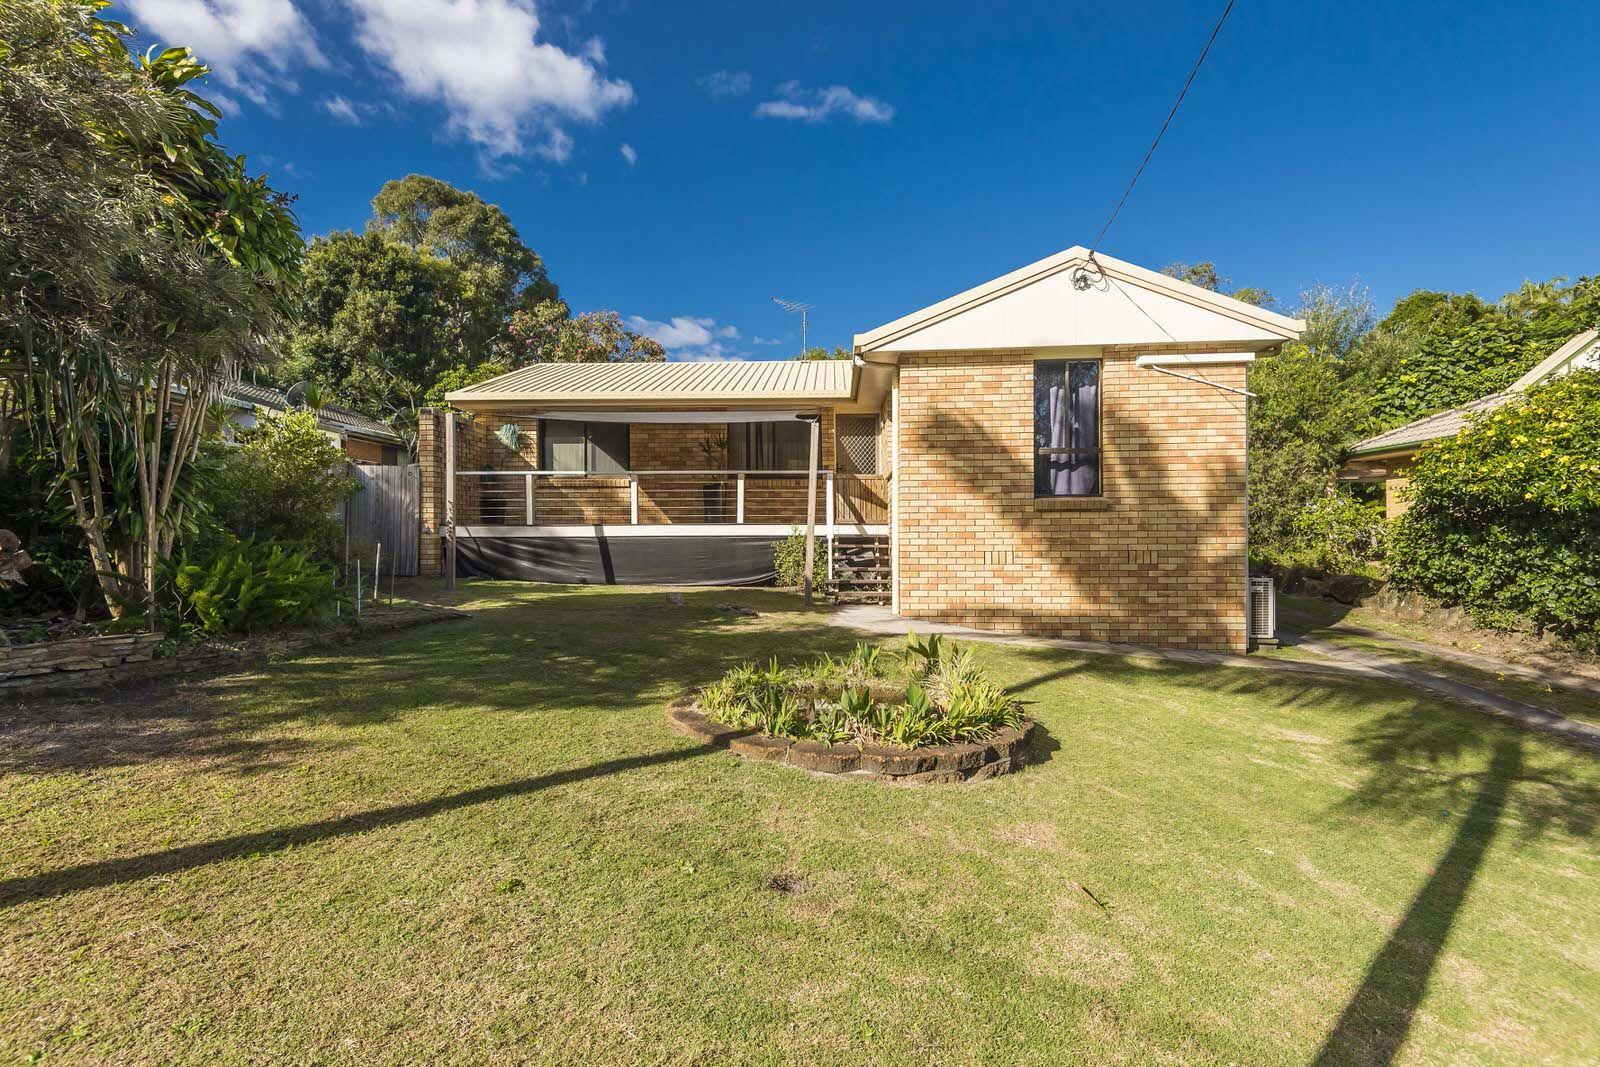 43 Sunderland Street, Evans Head NSW 2473, Image 1